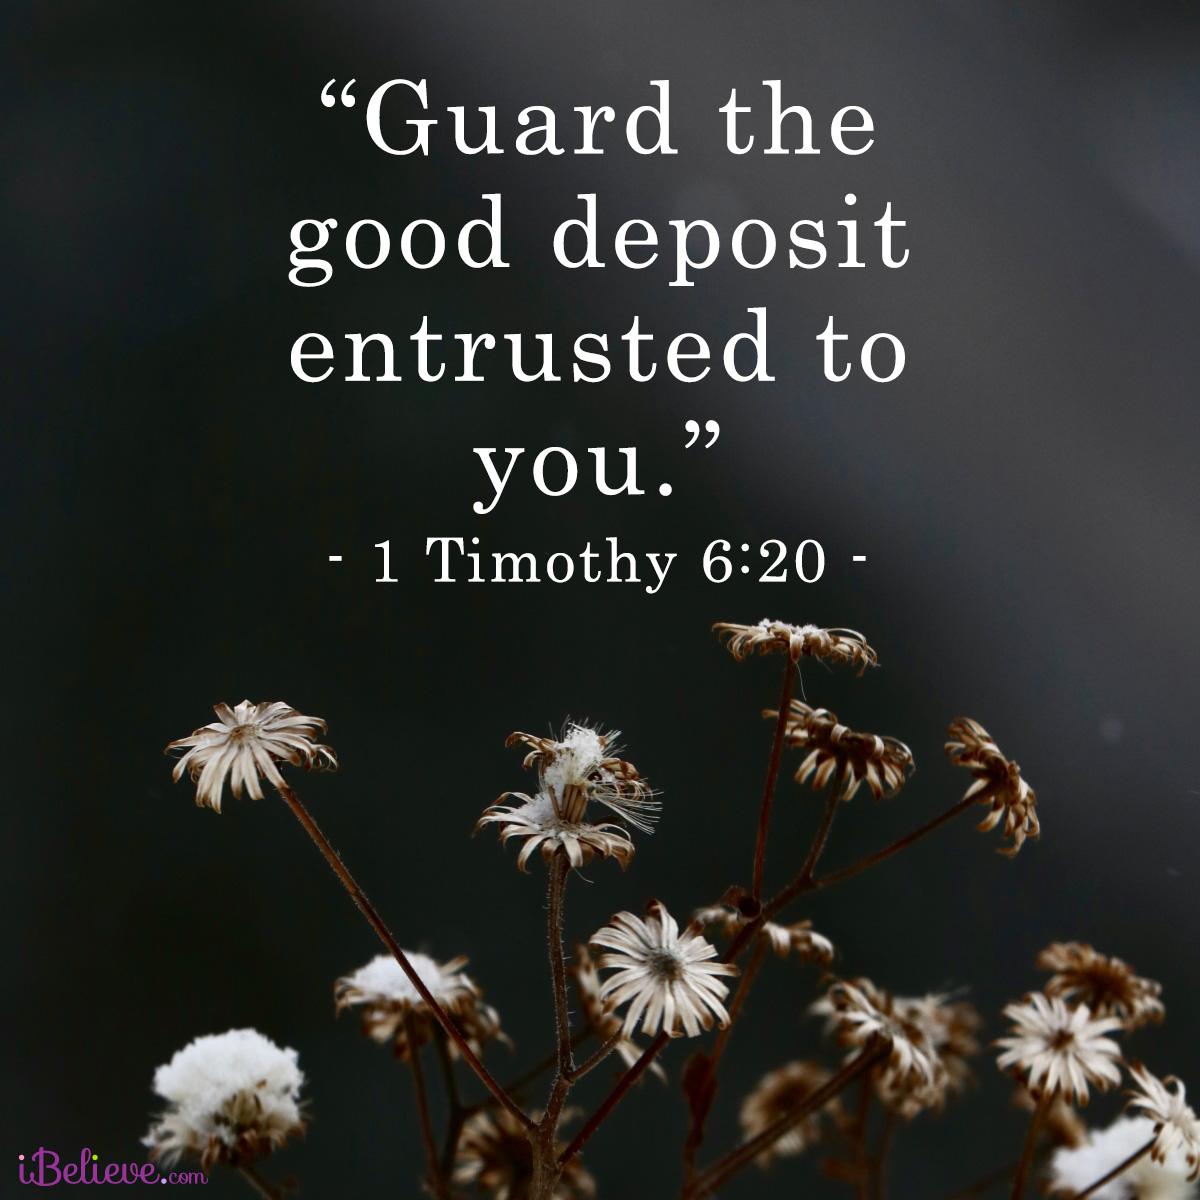 1 Timothy 6:20